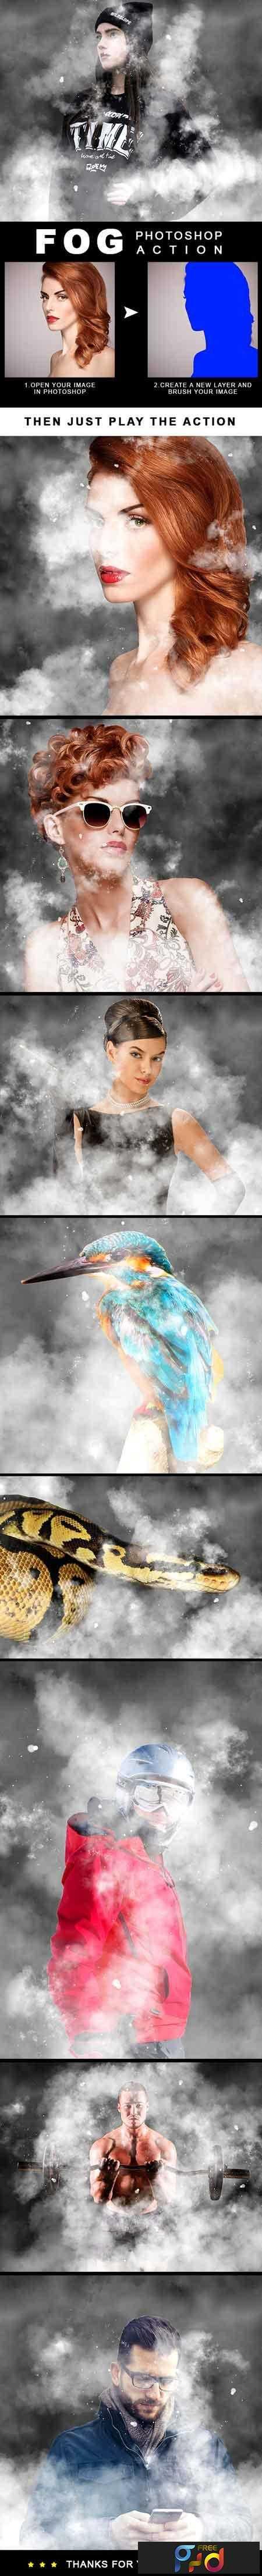 1810286 Fog Effect Photoshop Action 22383532 1